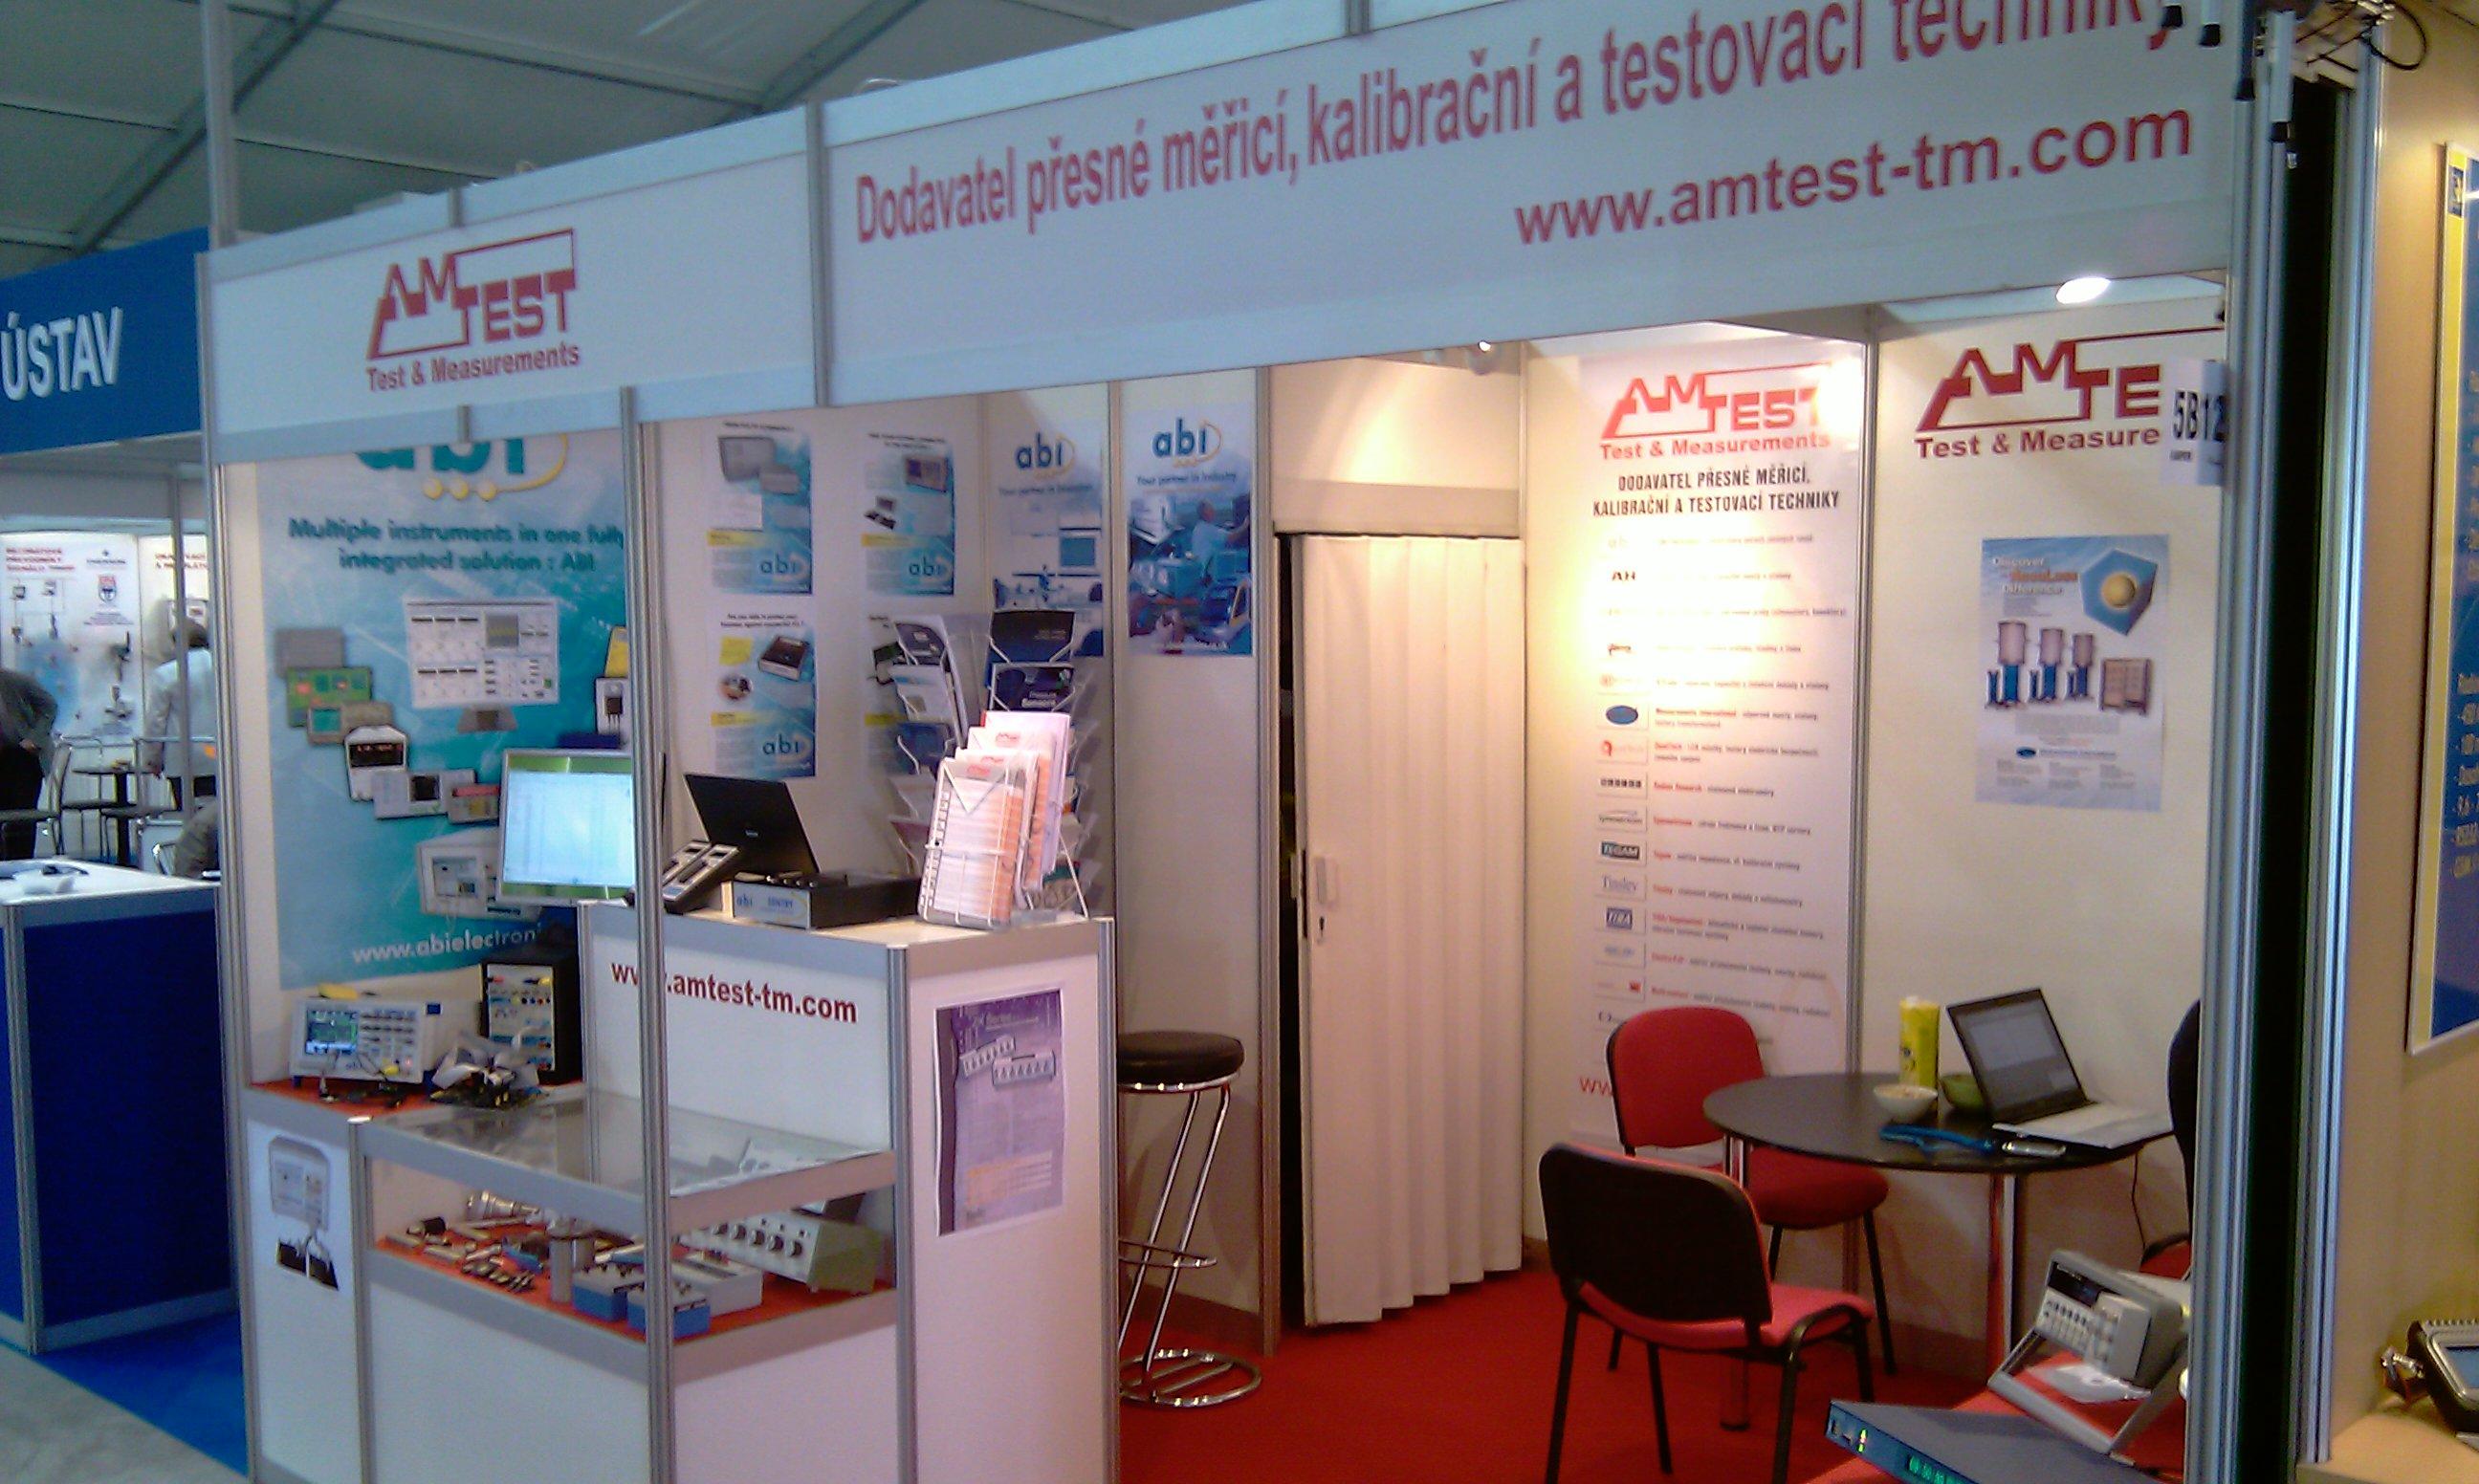 Exhibition Stand Invitation : Amtest tm exhibition amper